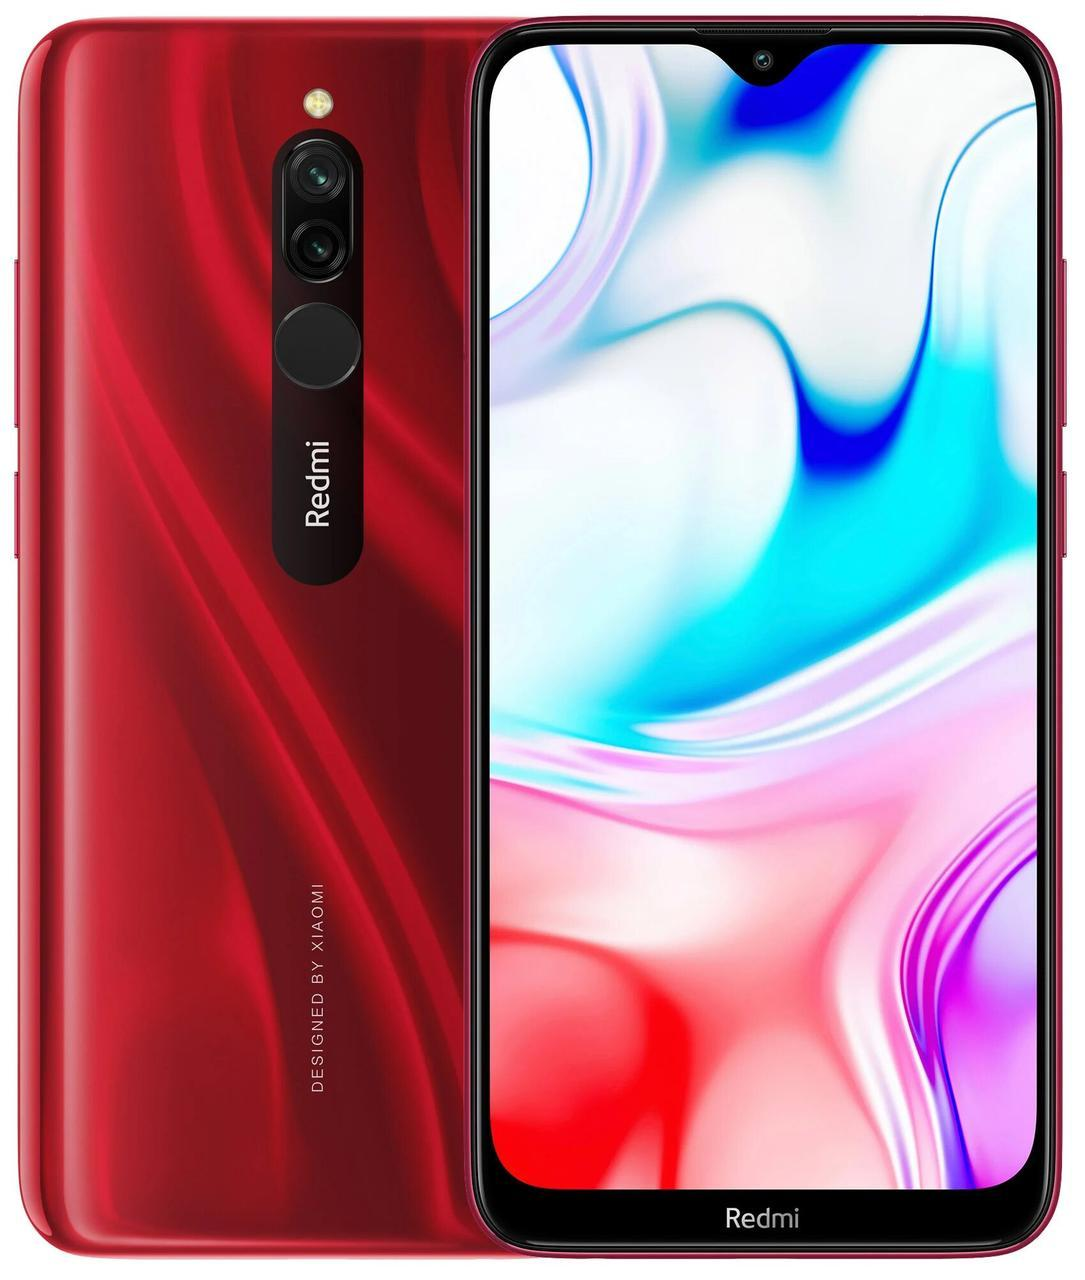 Redmi 8 3/32Gb (Red)